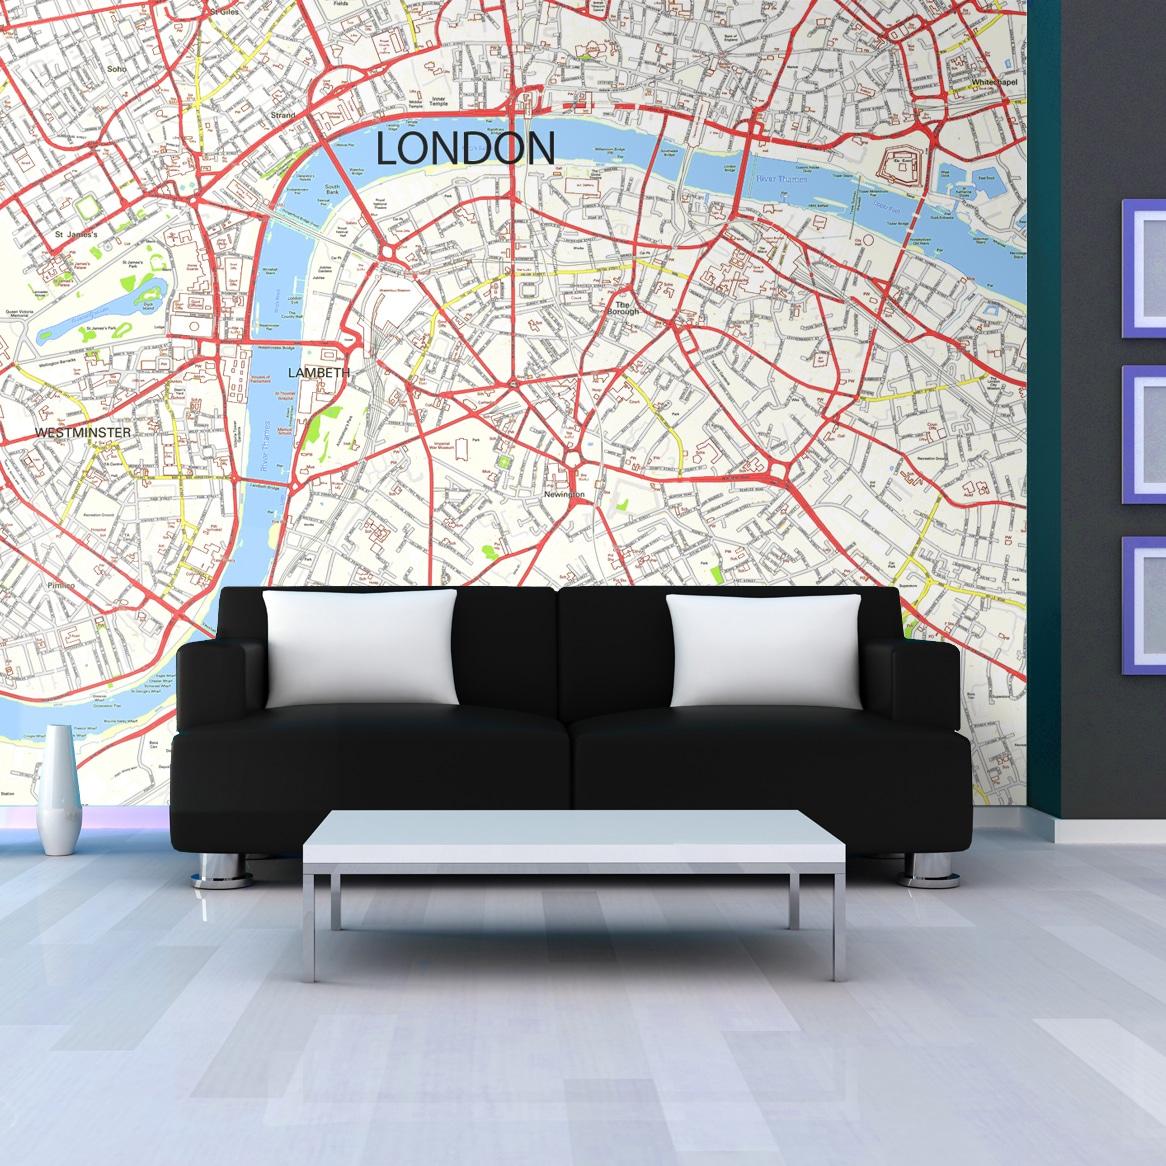 London Street Map Wallpaper